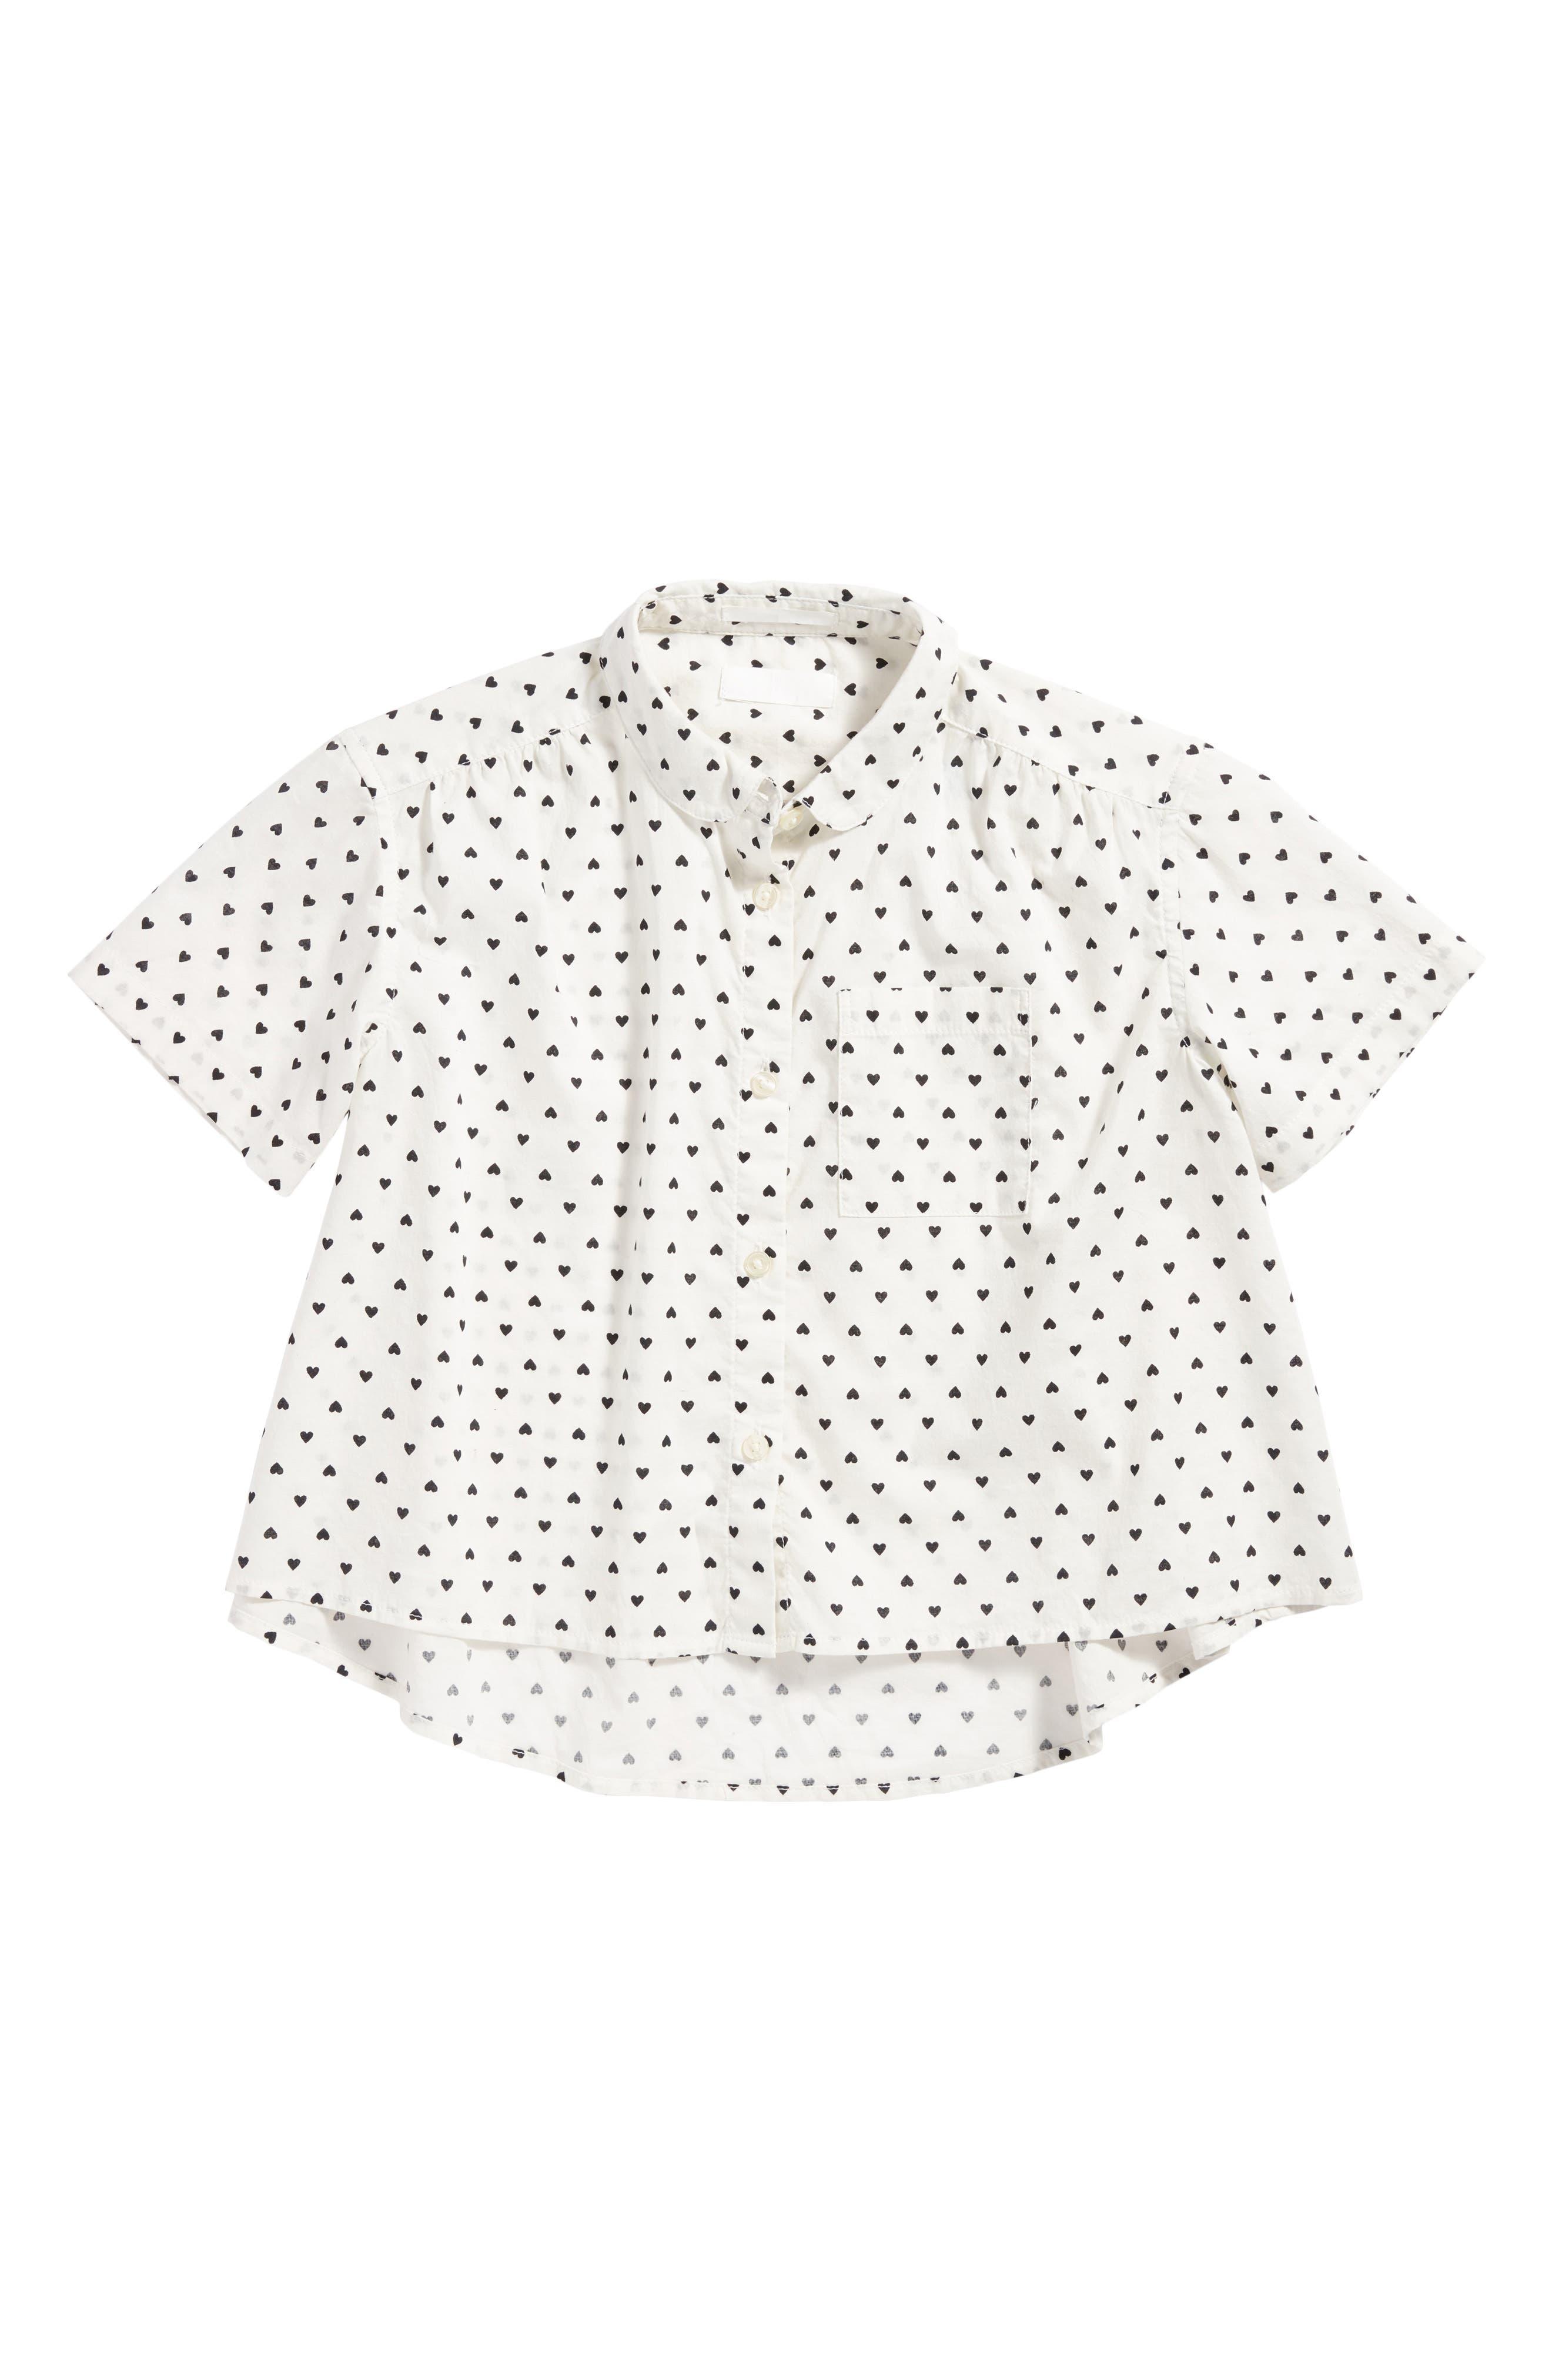 Heart Print Cotton Top,                         Main,                         color, White- Black Hearts